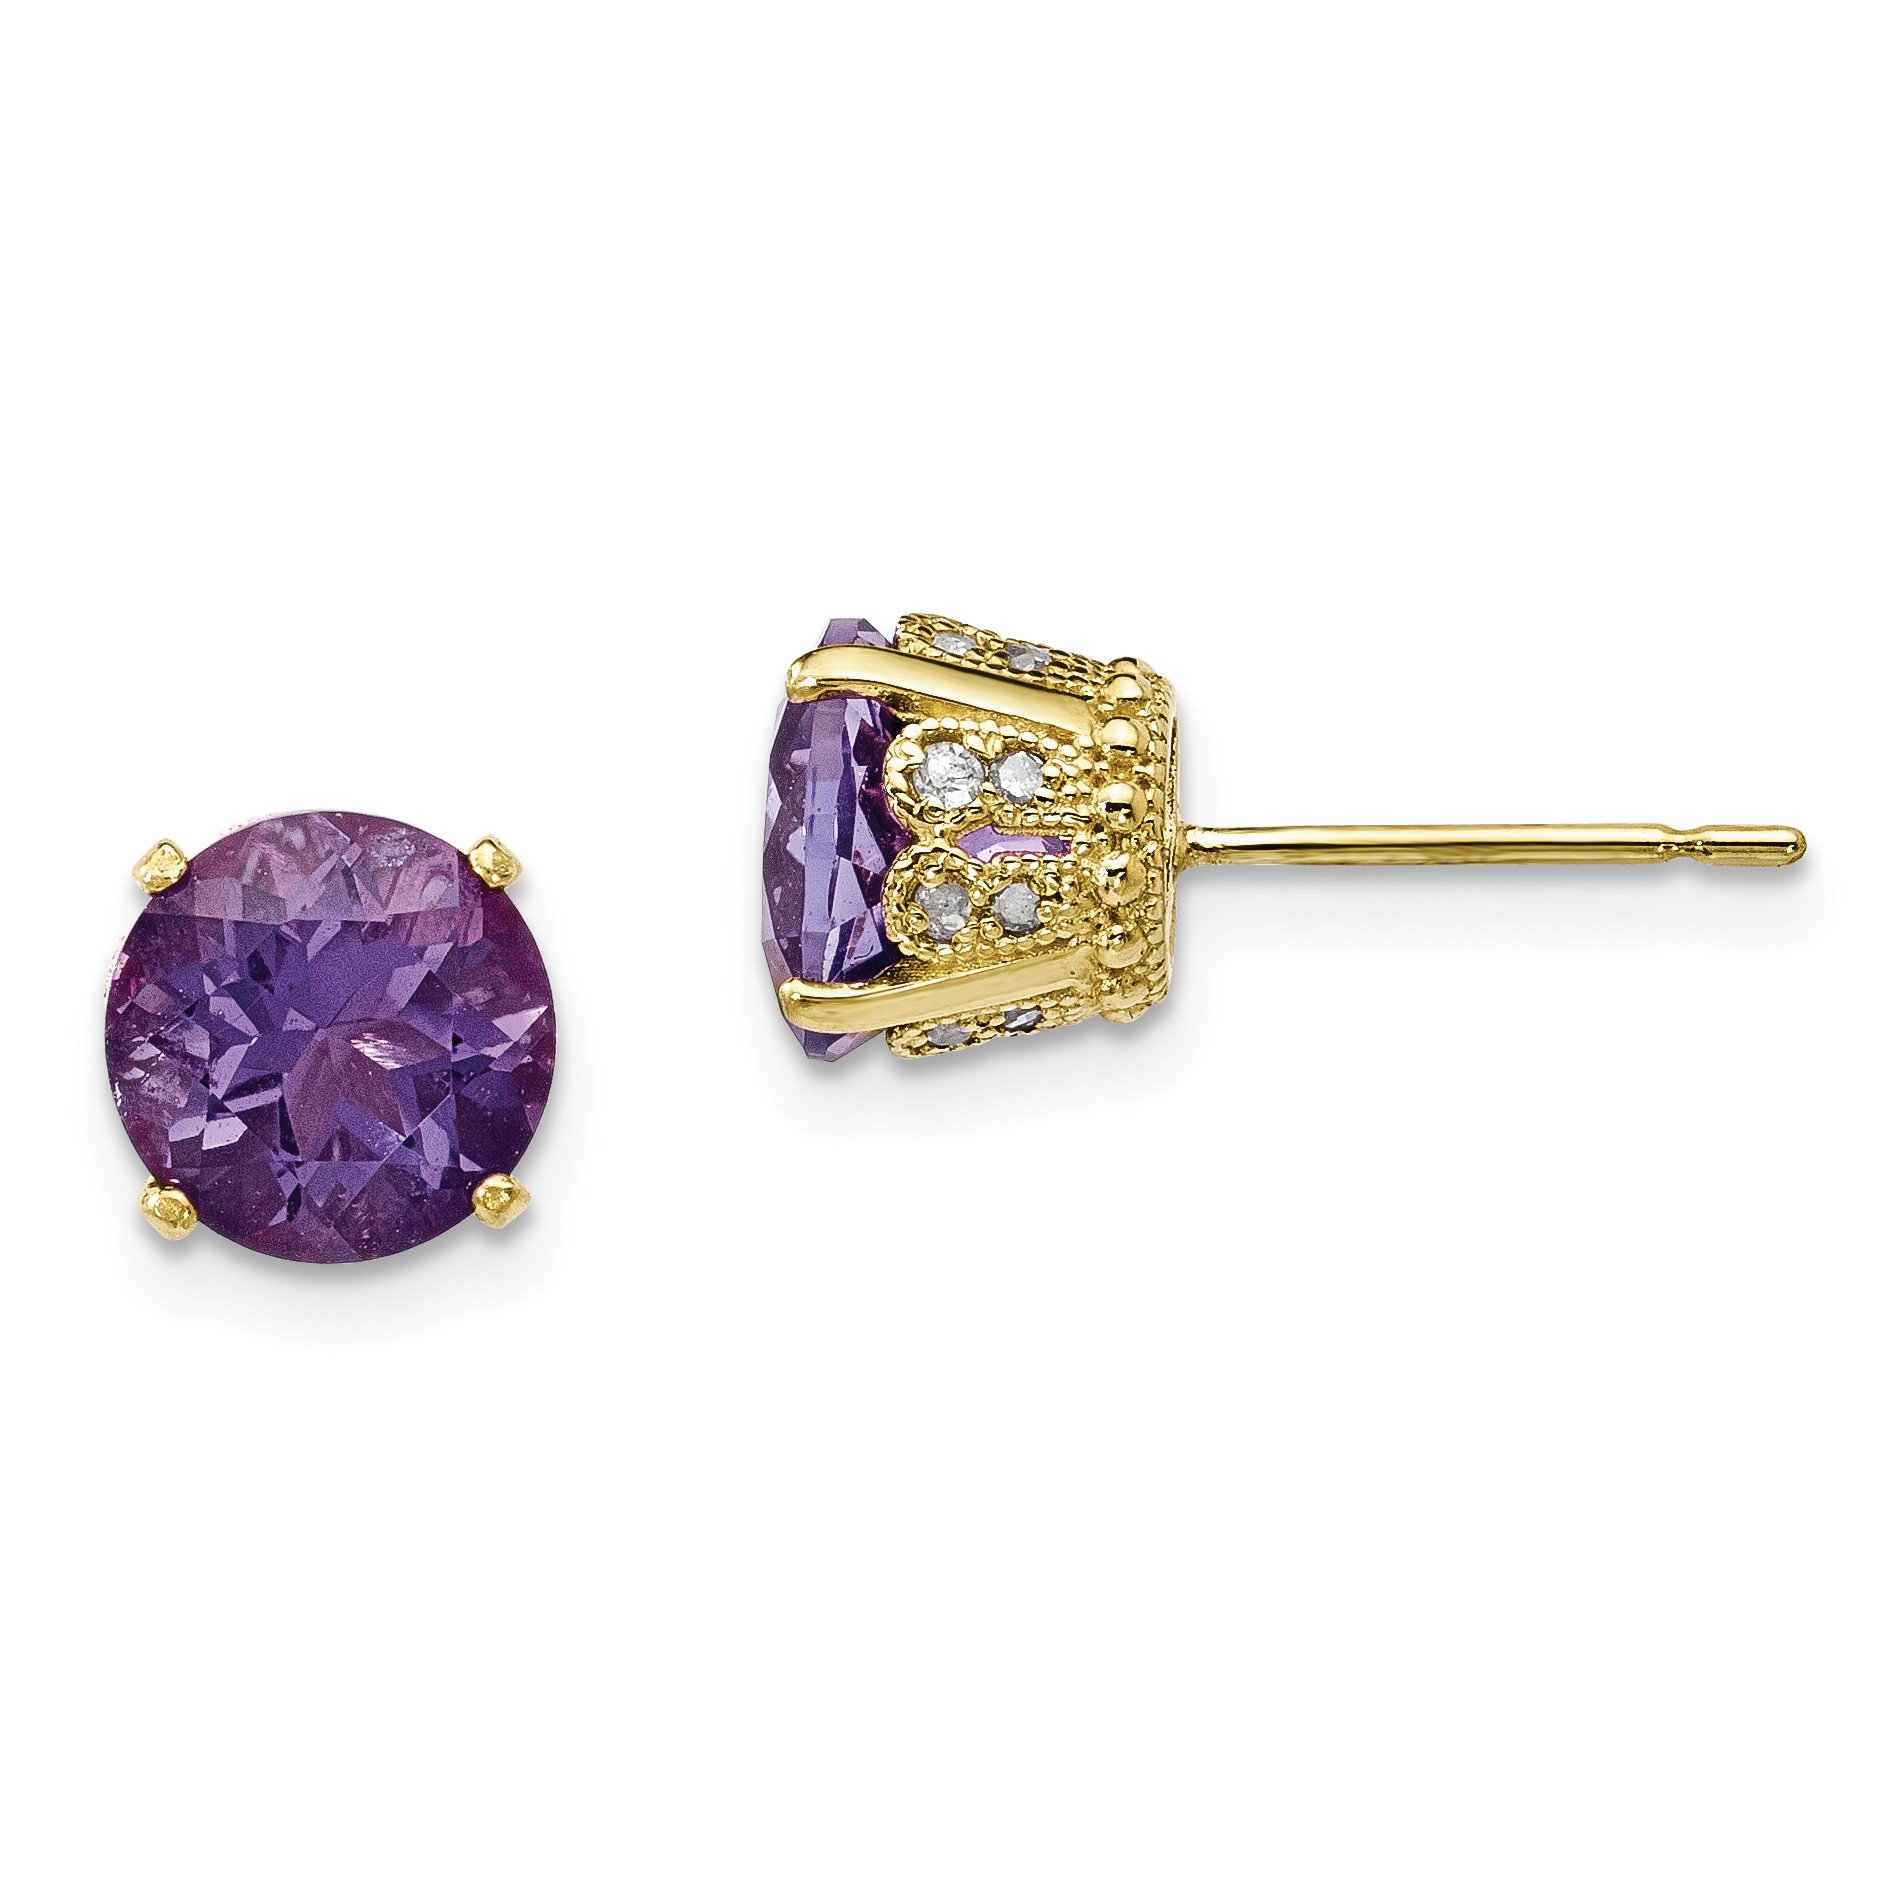 ICE CARATS 10k Yellow Gold Tiara Collection Diamond Purple Amethyst Post Stud Ball Button Earrings Set Birthstone Yc Fine Jewelry Gift Set For Women Heart